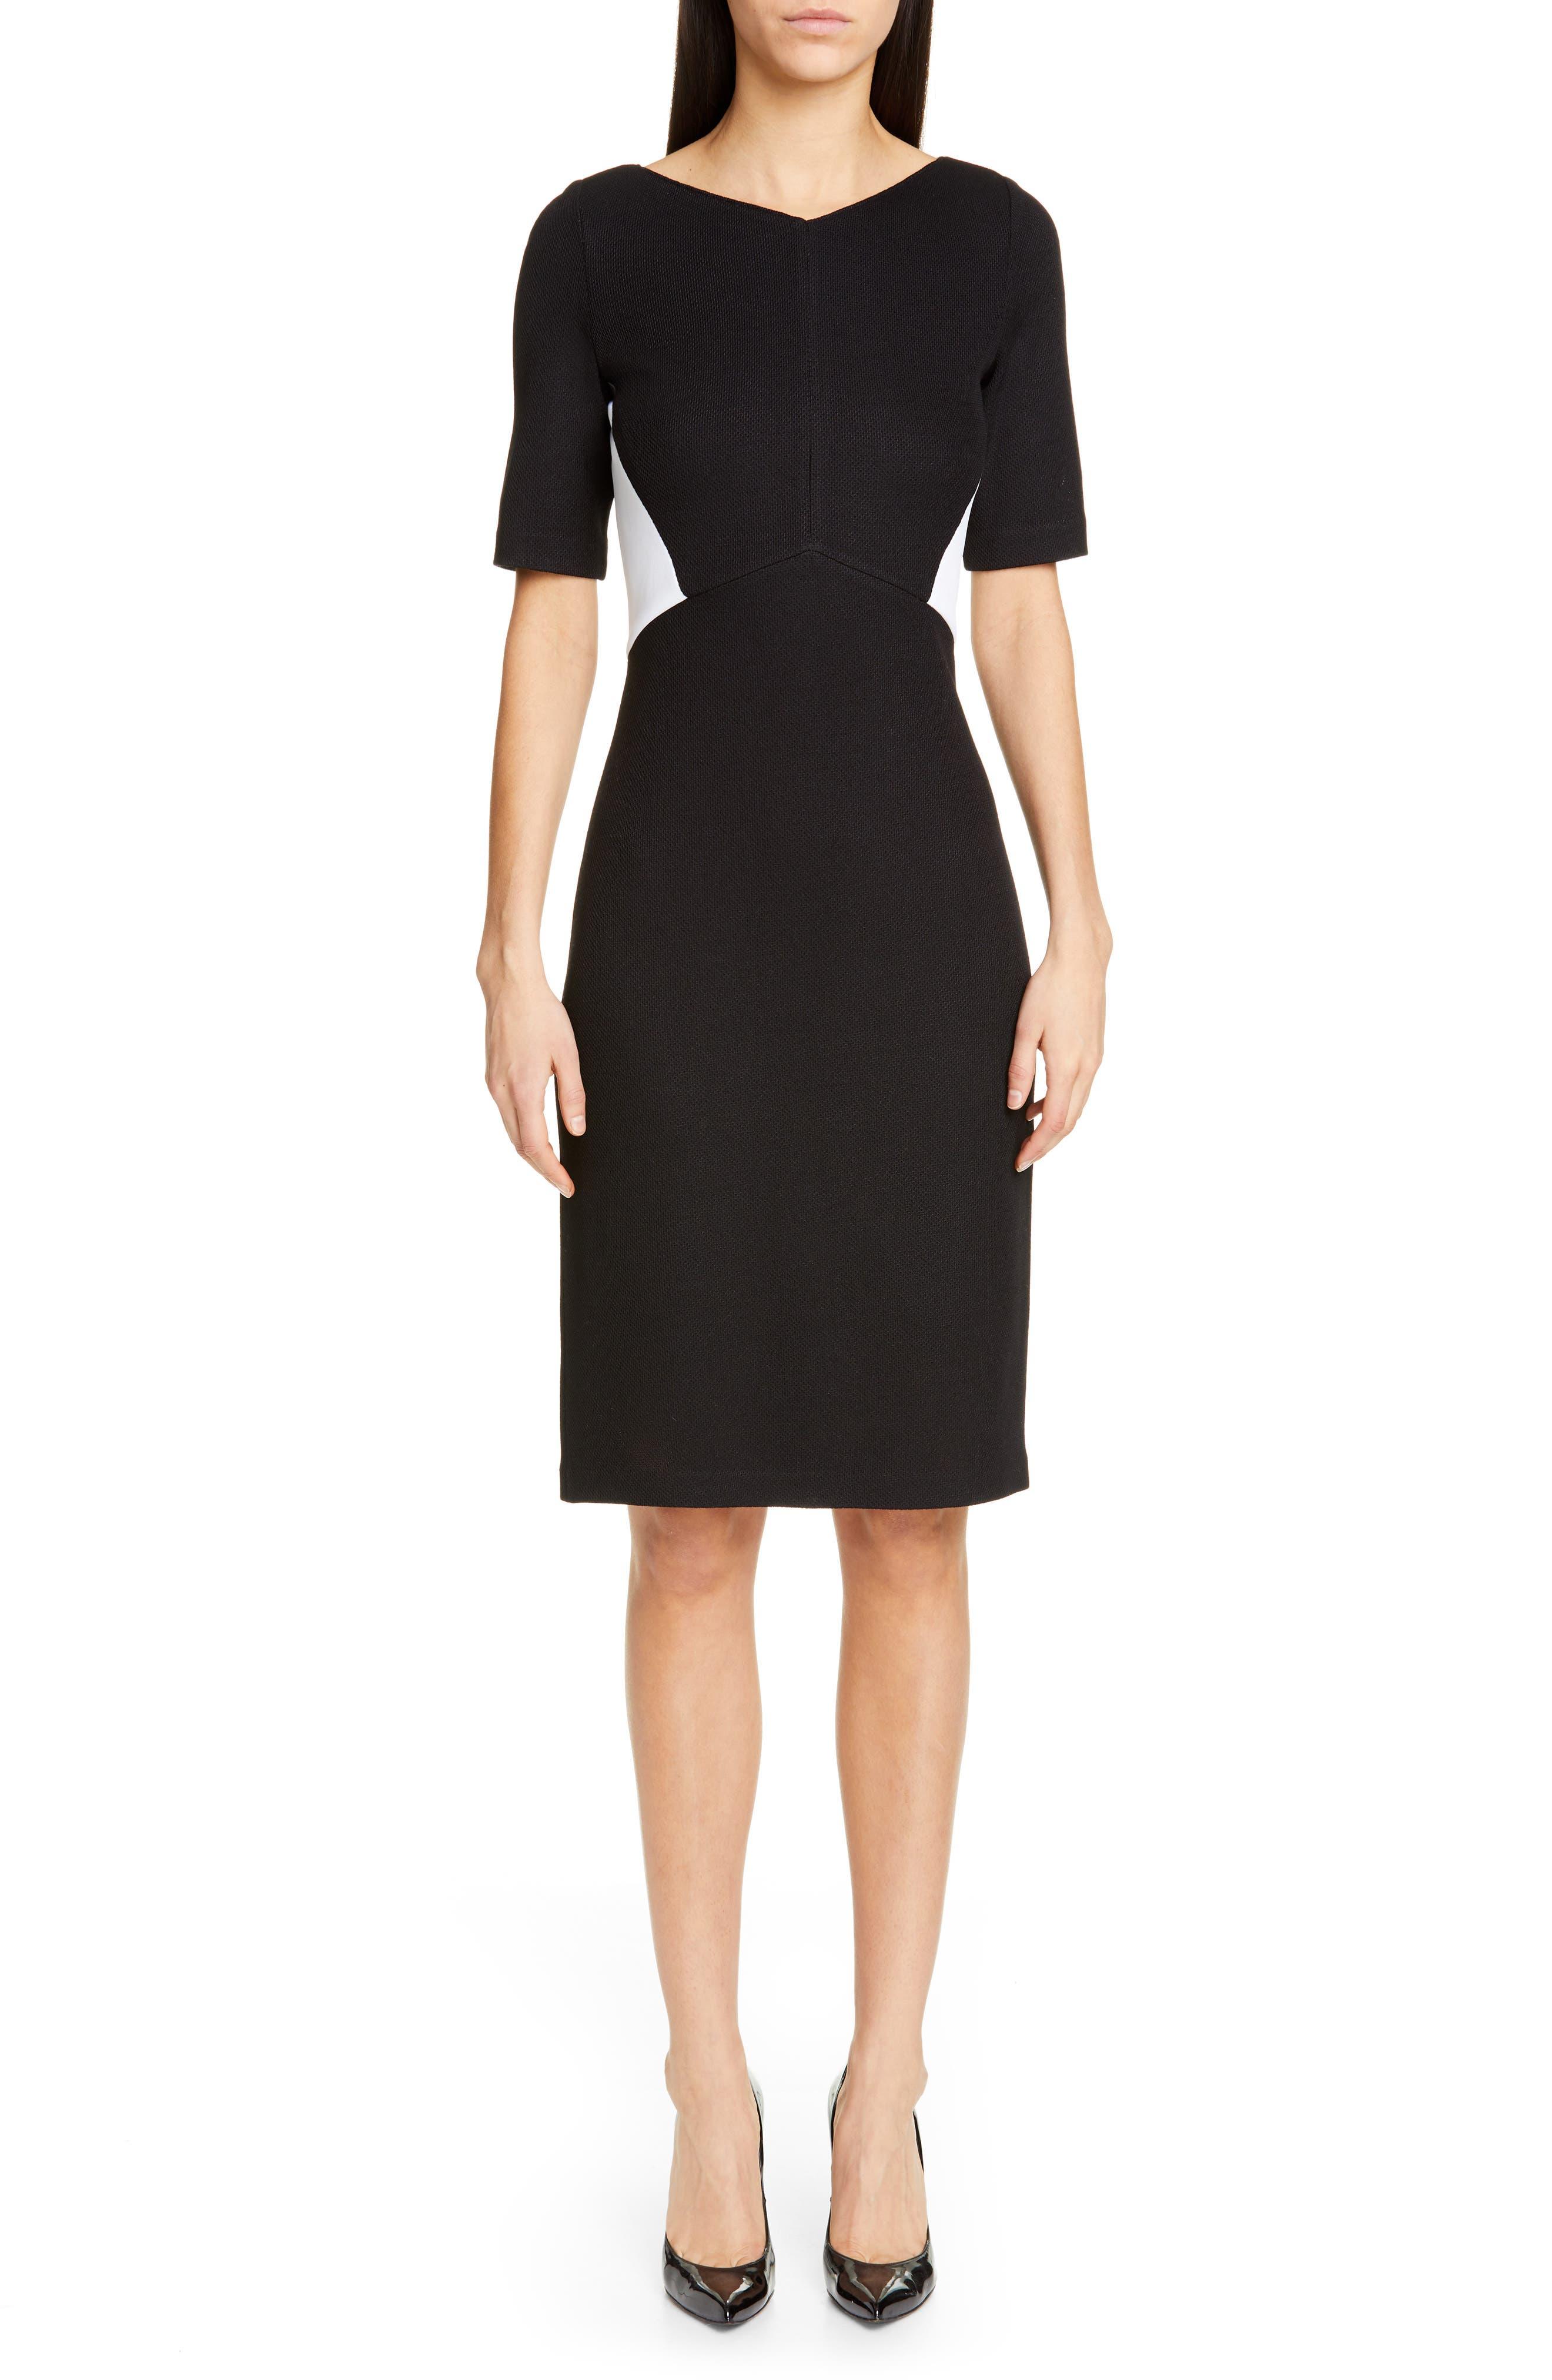 St. John Collection Pique Milano Knit Dress, Black